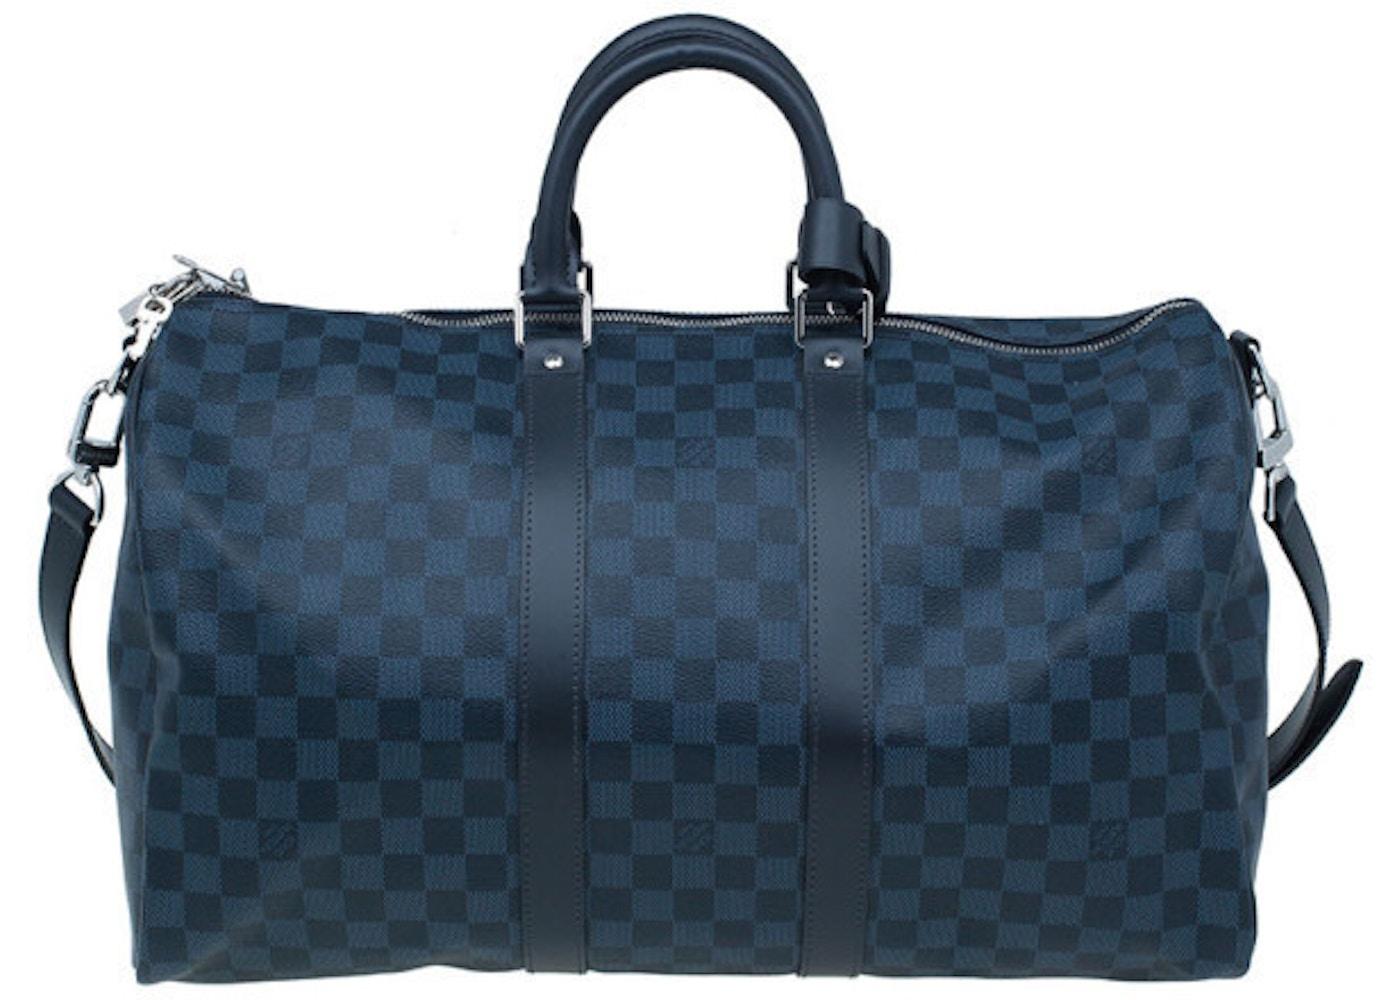 df237c23df796 Buy   Sell Louis Vuitton Keepall Handbags - Total Sold